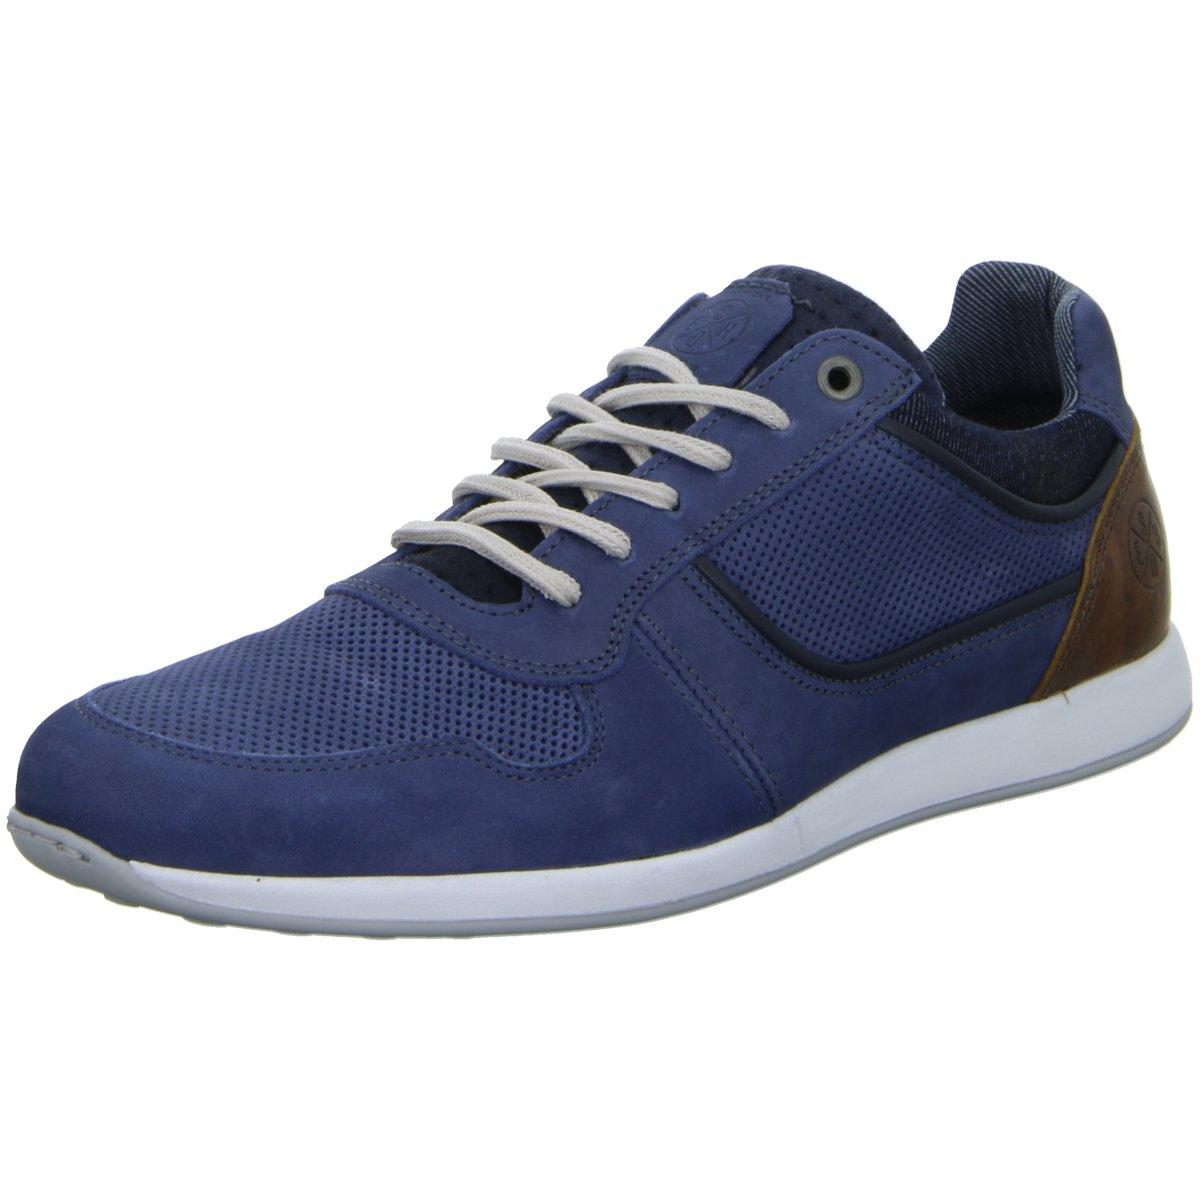 NEU Bullboxer Herren Sneaker Schnürhalbschuh 132K26343APRBCSU40 blau 407012